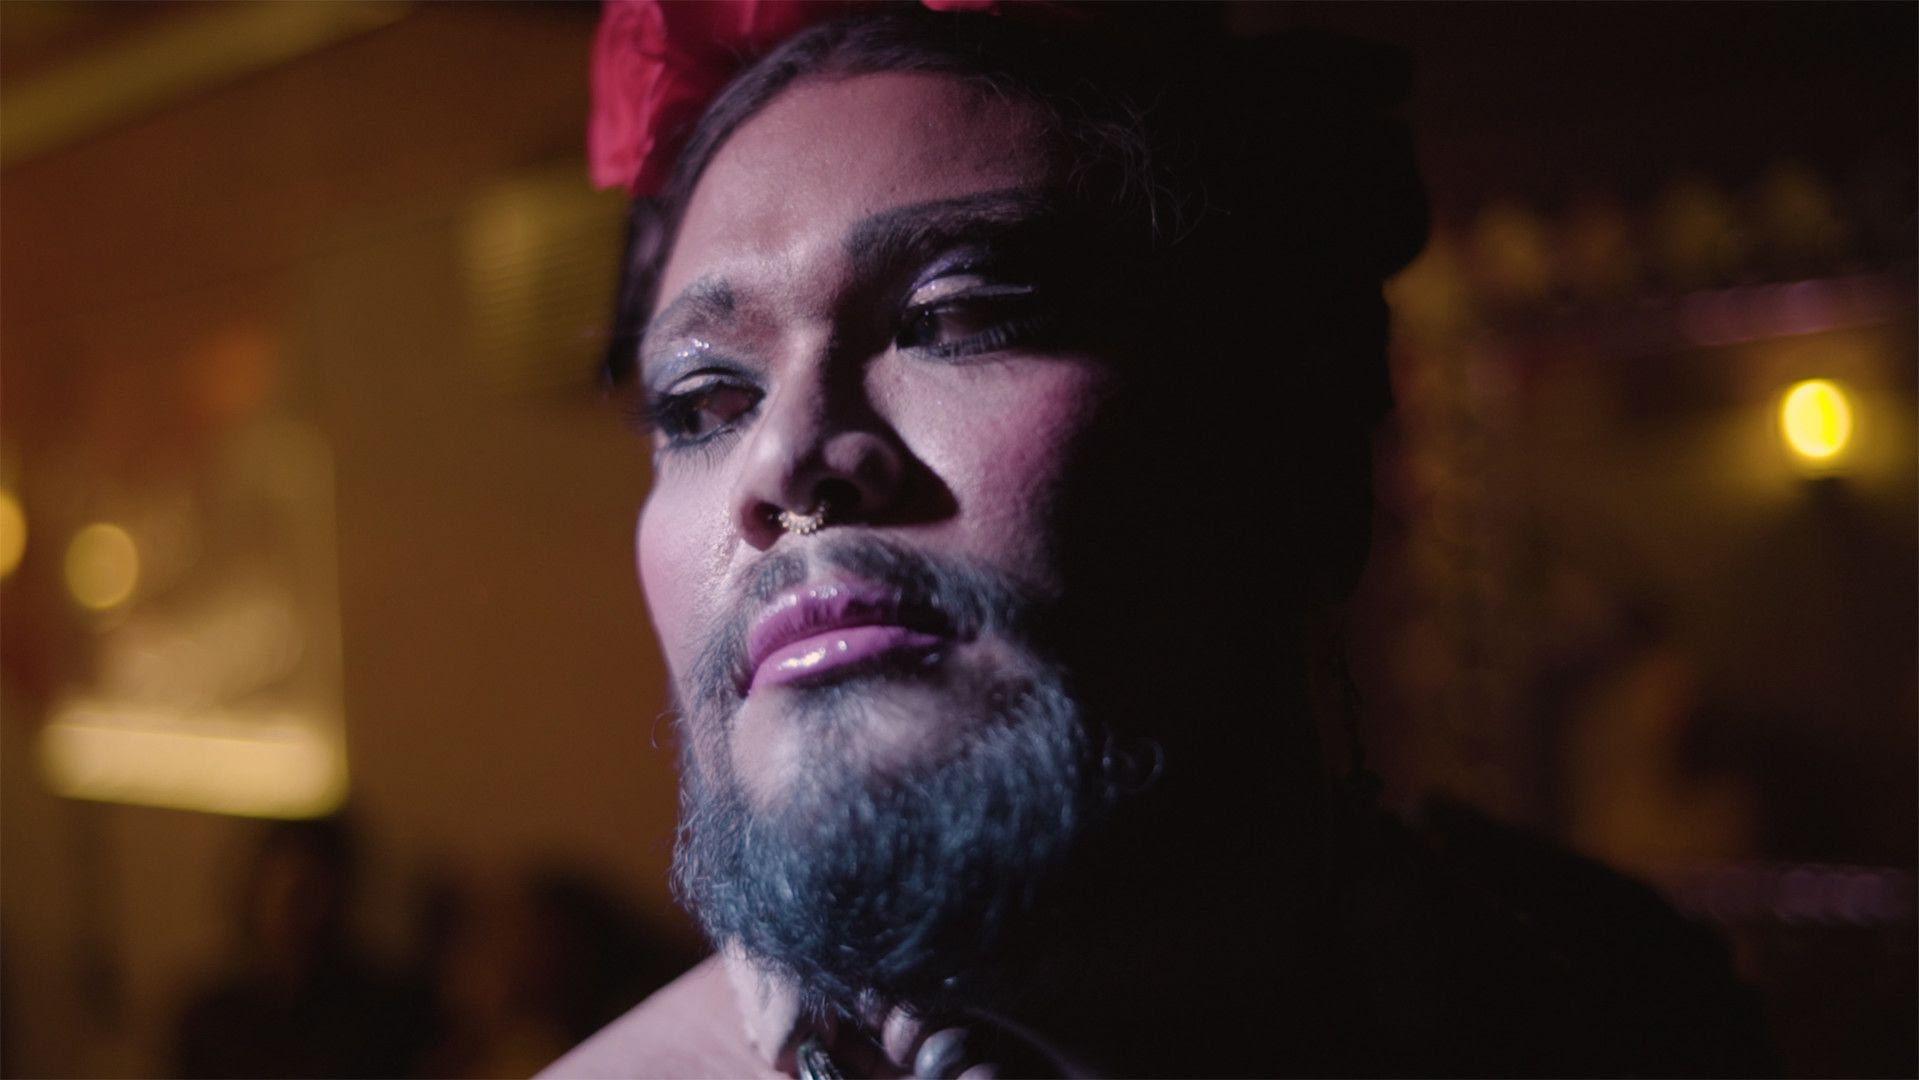 Mira cortos LGBT+ gratis en FilminLatino